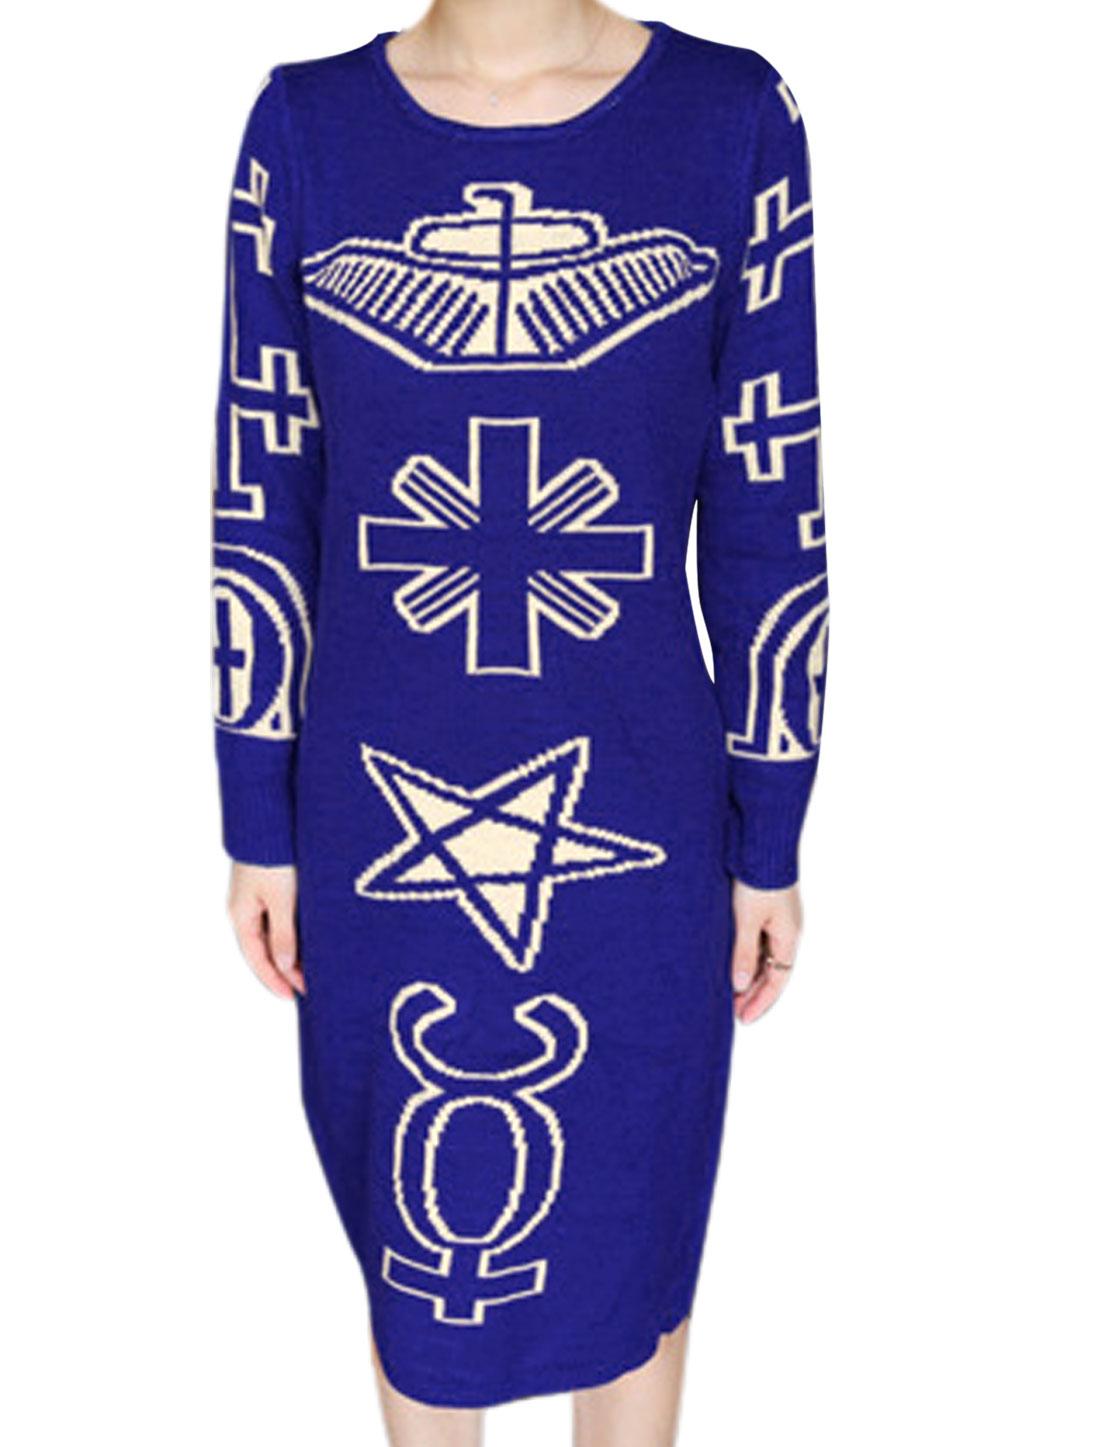 Women Ribbed Cuffs w Hem Cross Stars Novelty Pattern Knit Dress Royal Blue M